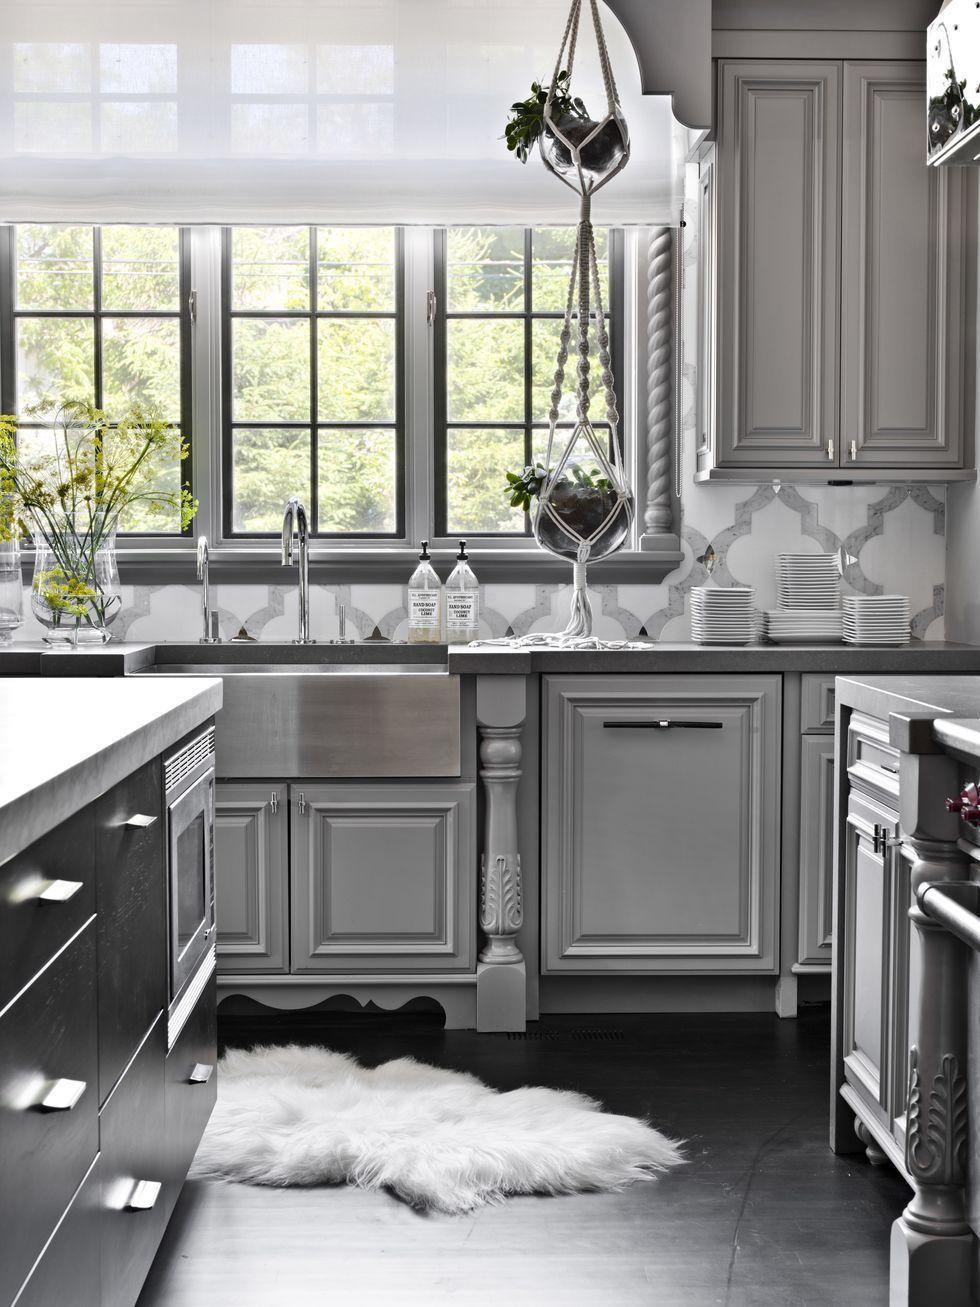 20 Eye-Catching Kitchen Tile Backsplash Ideas to Love & 20 Gorgeous Kitchen Tile Backsplashes - Best Kitchen Tile Ideas